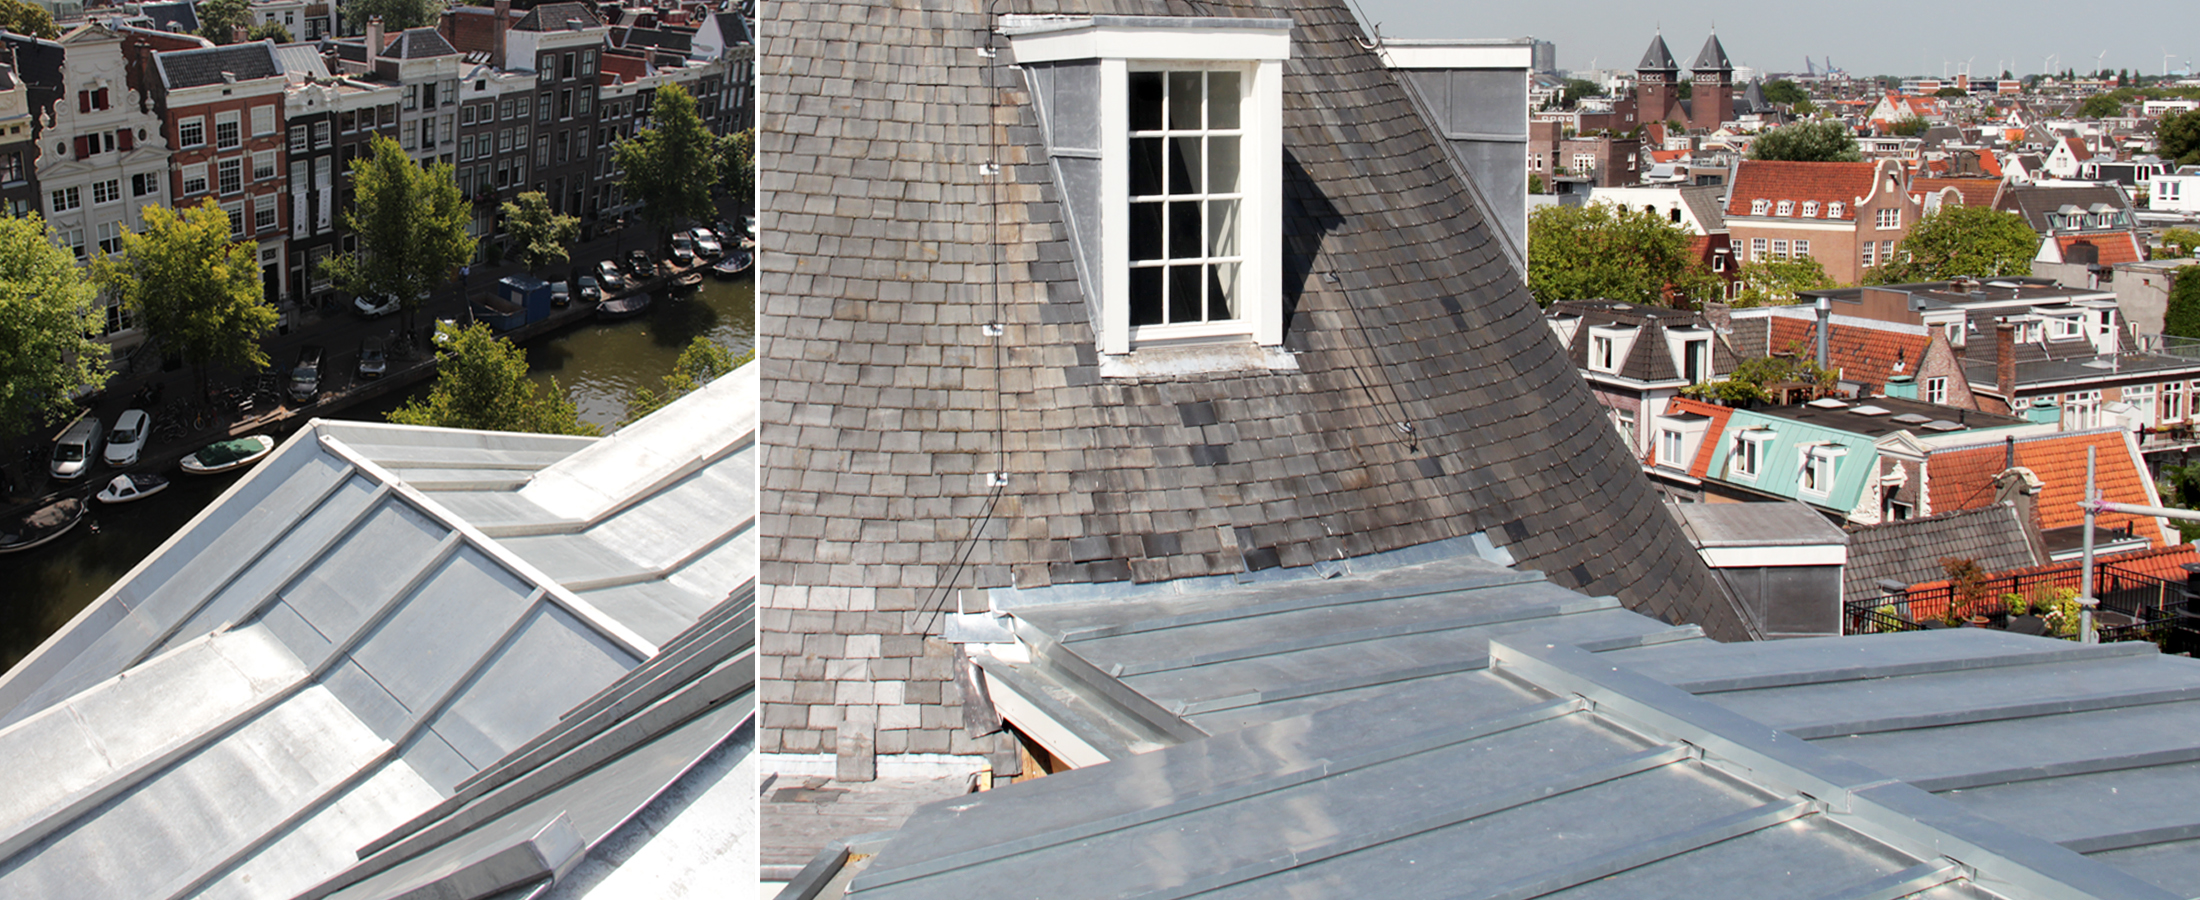 Nieuw dak Felix Meritis gereed